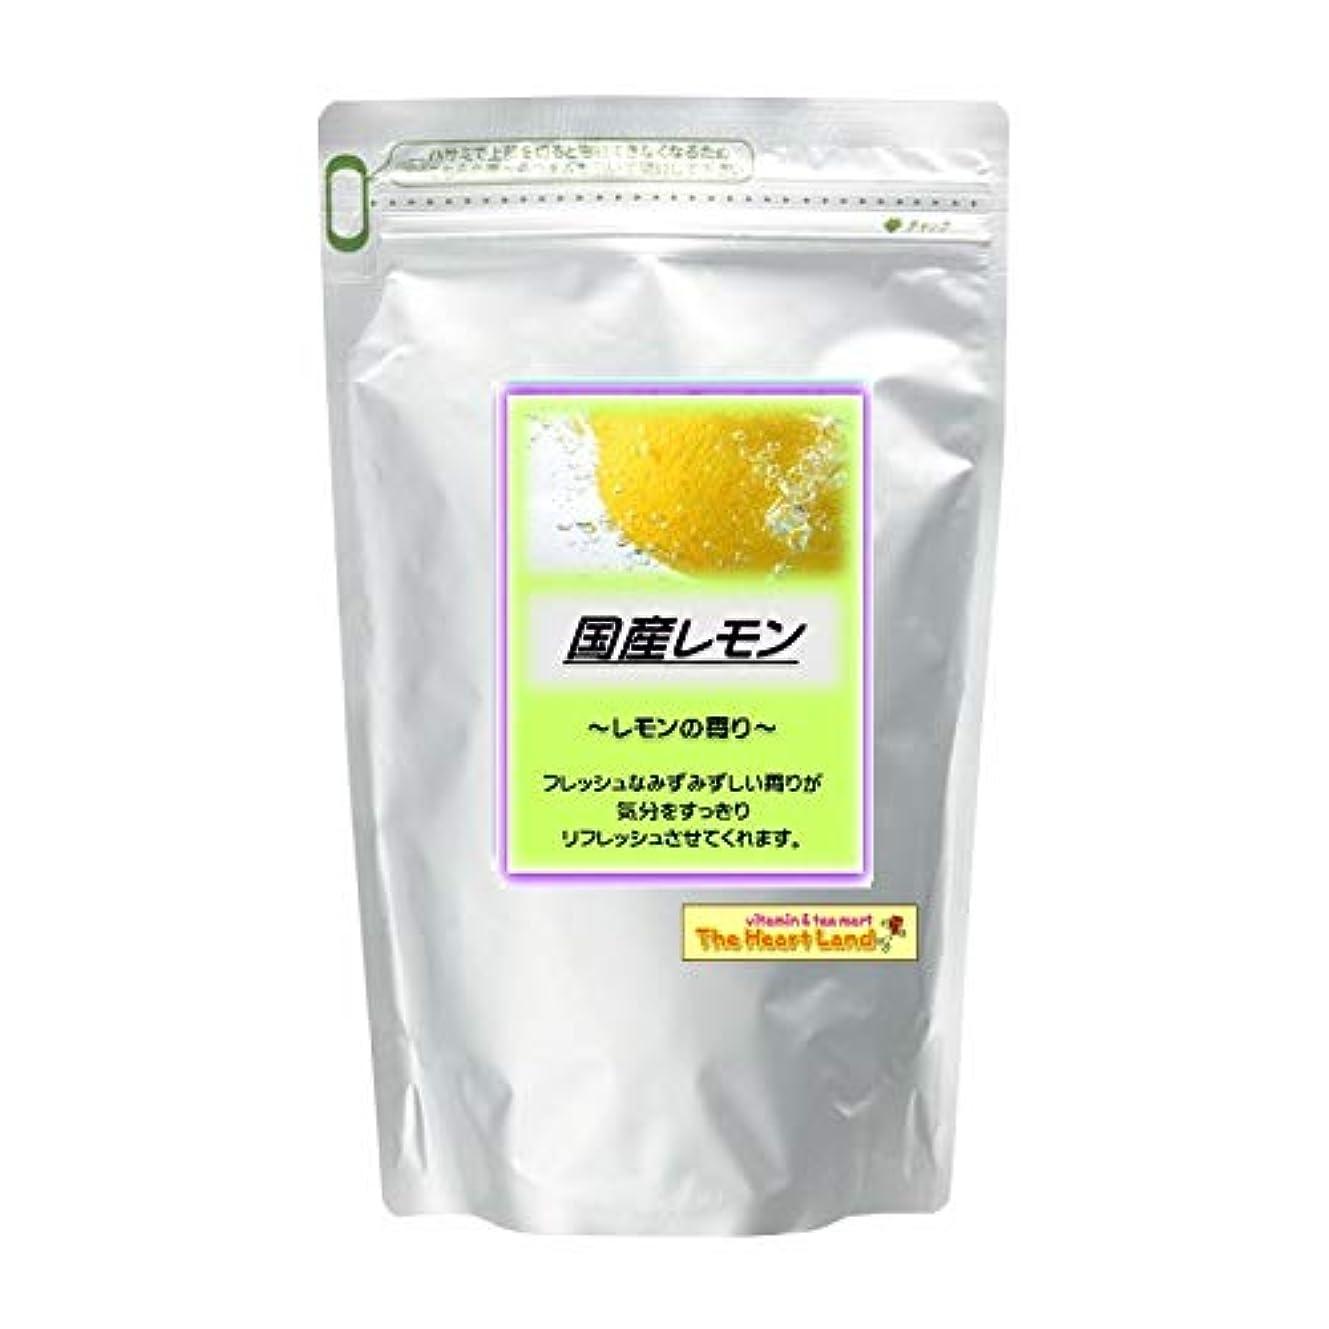 盗賊名誉確実アサヒ入浴剤 浴用入浴化粧品 国産レモン 300g